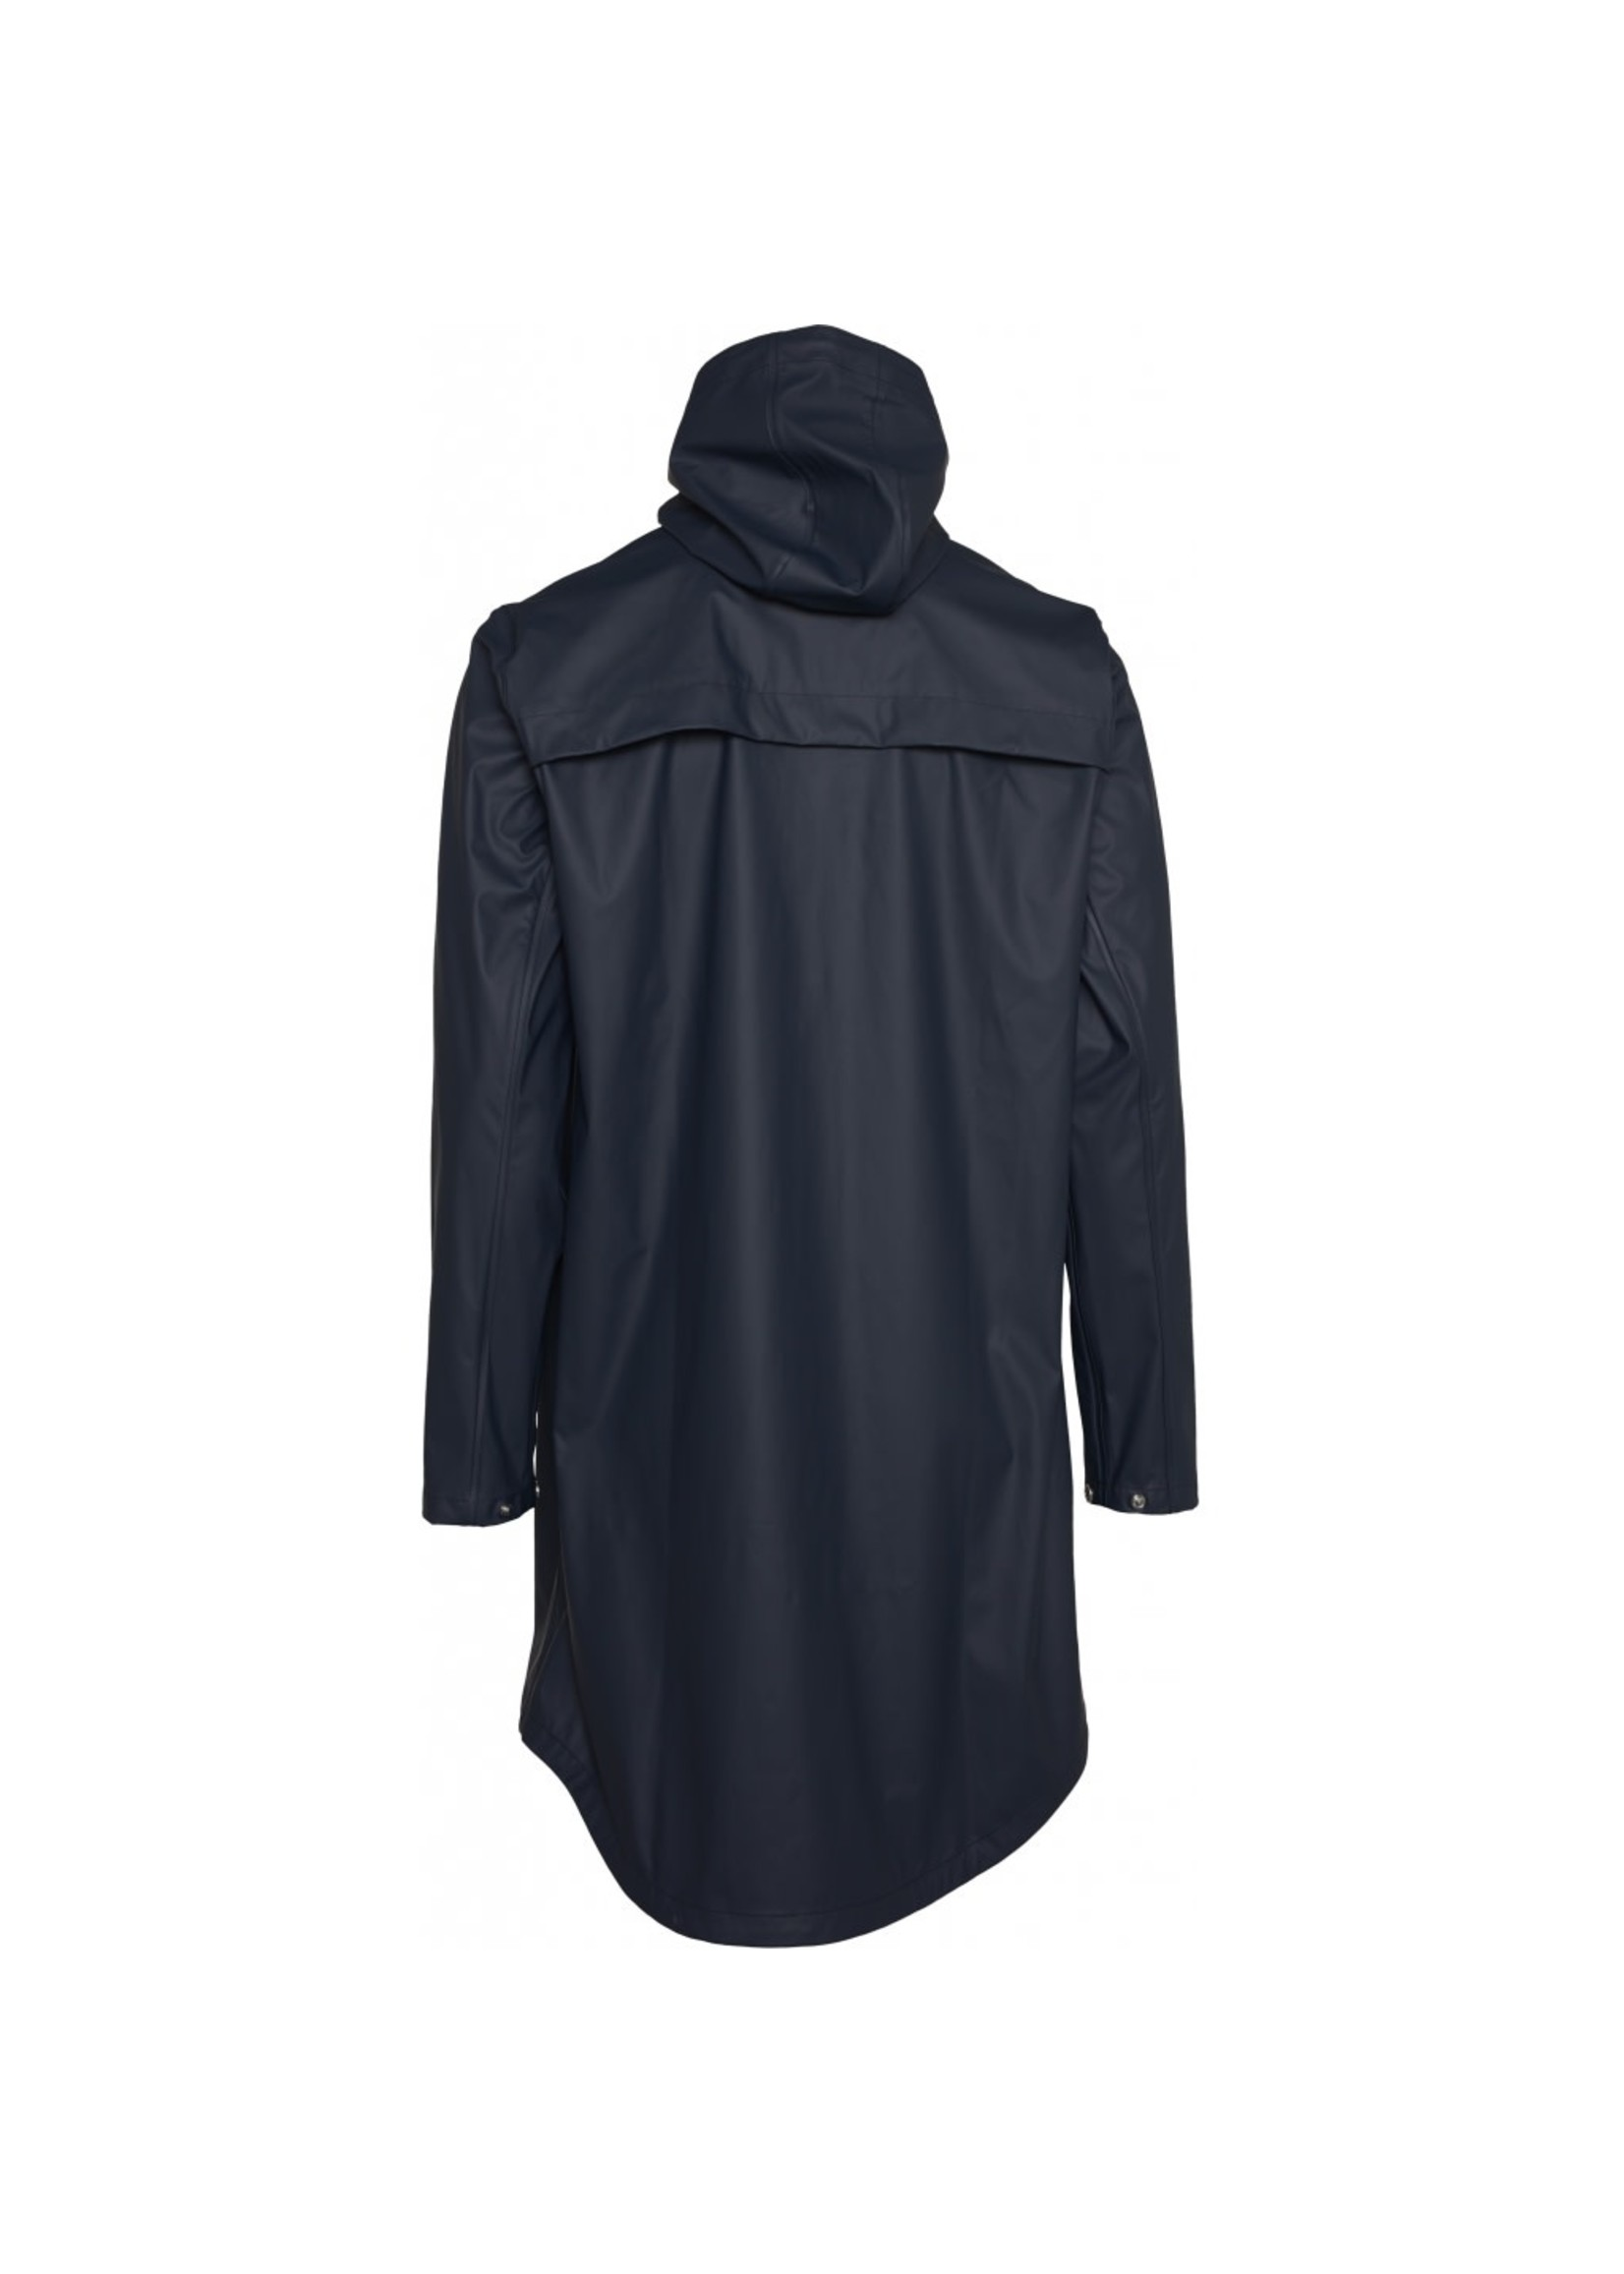 KnowledgeCotton KnowledgeCotton Lake Long rain jacket